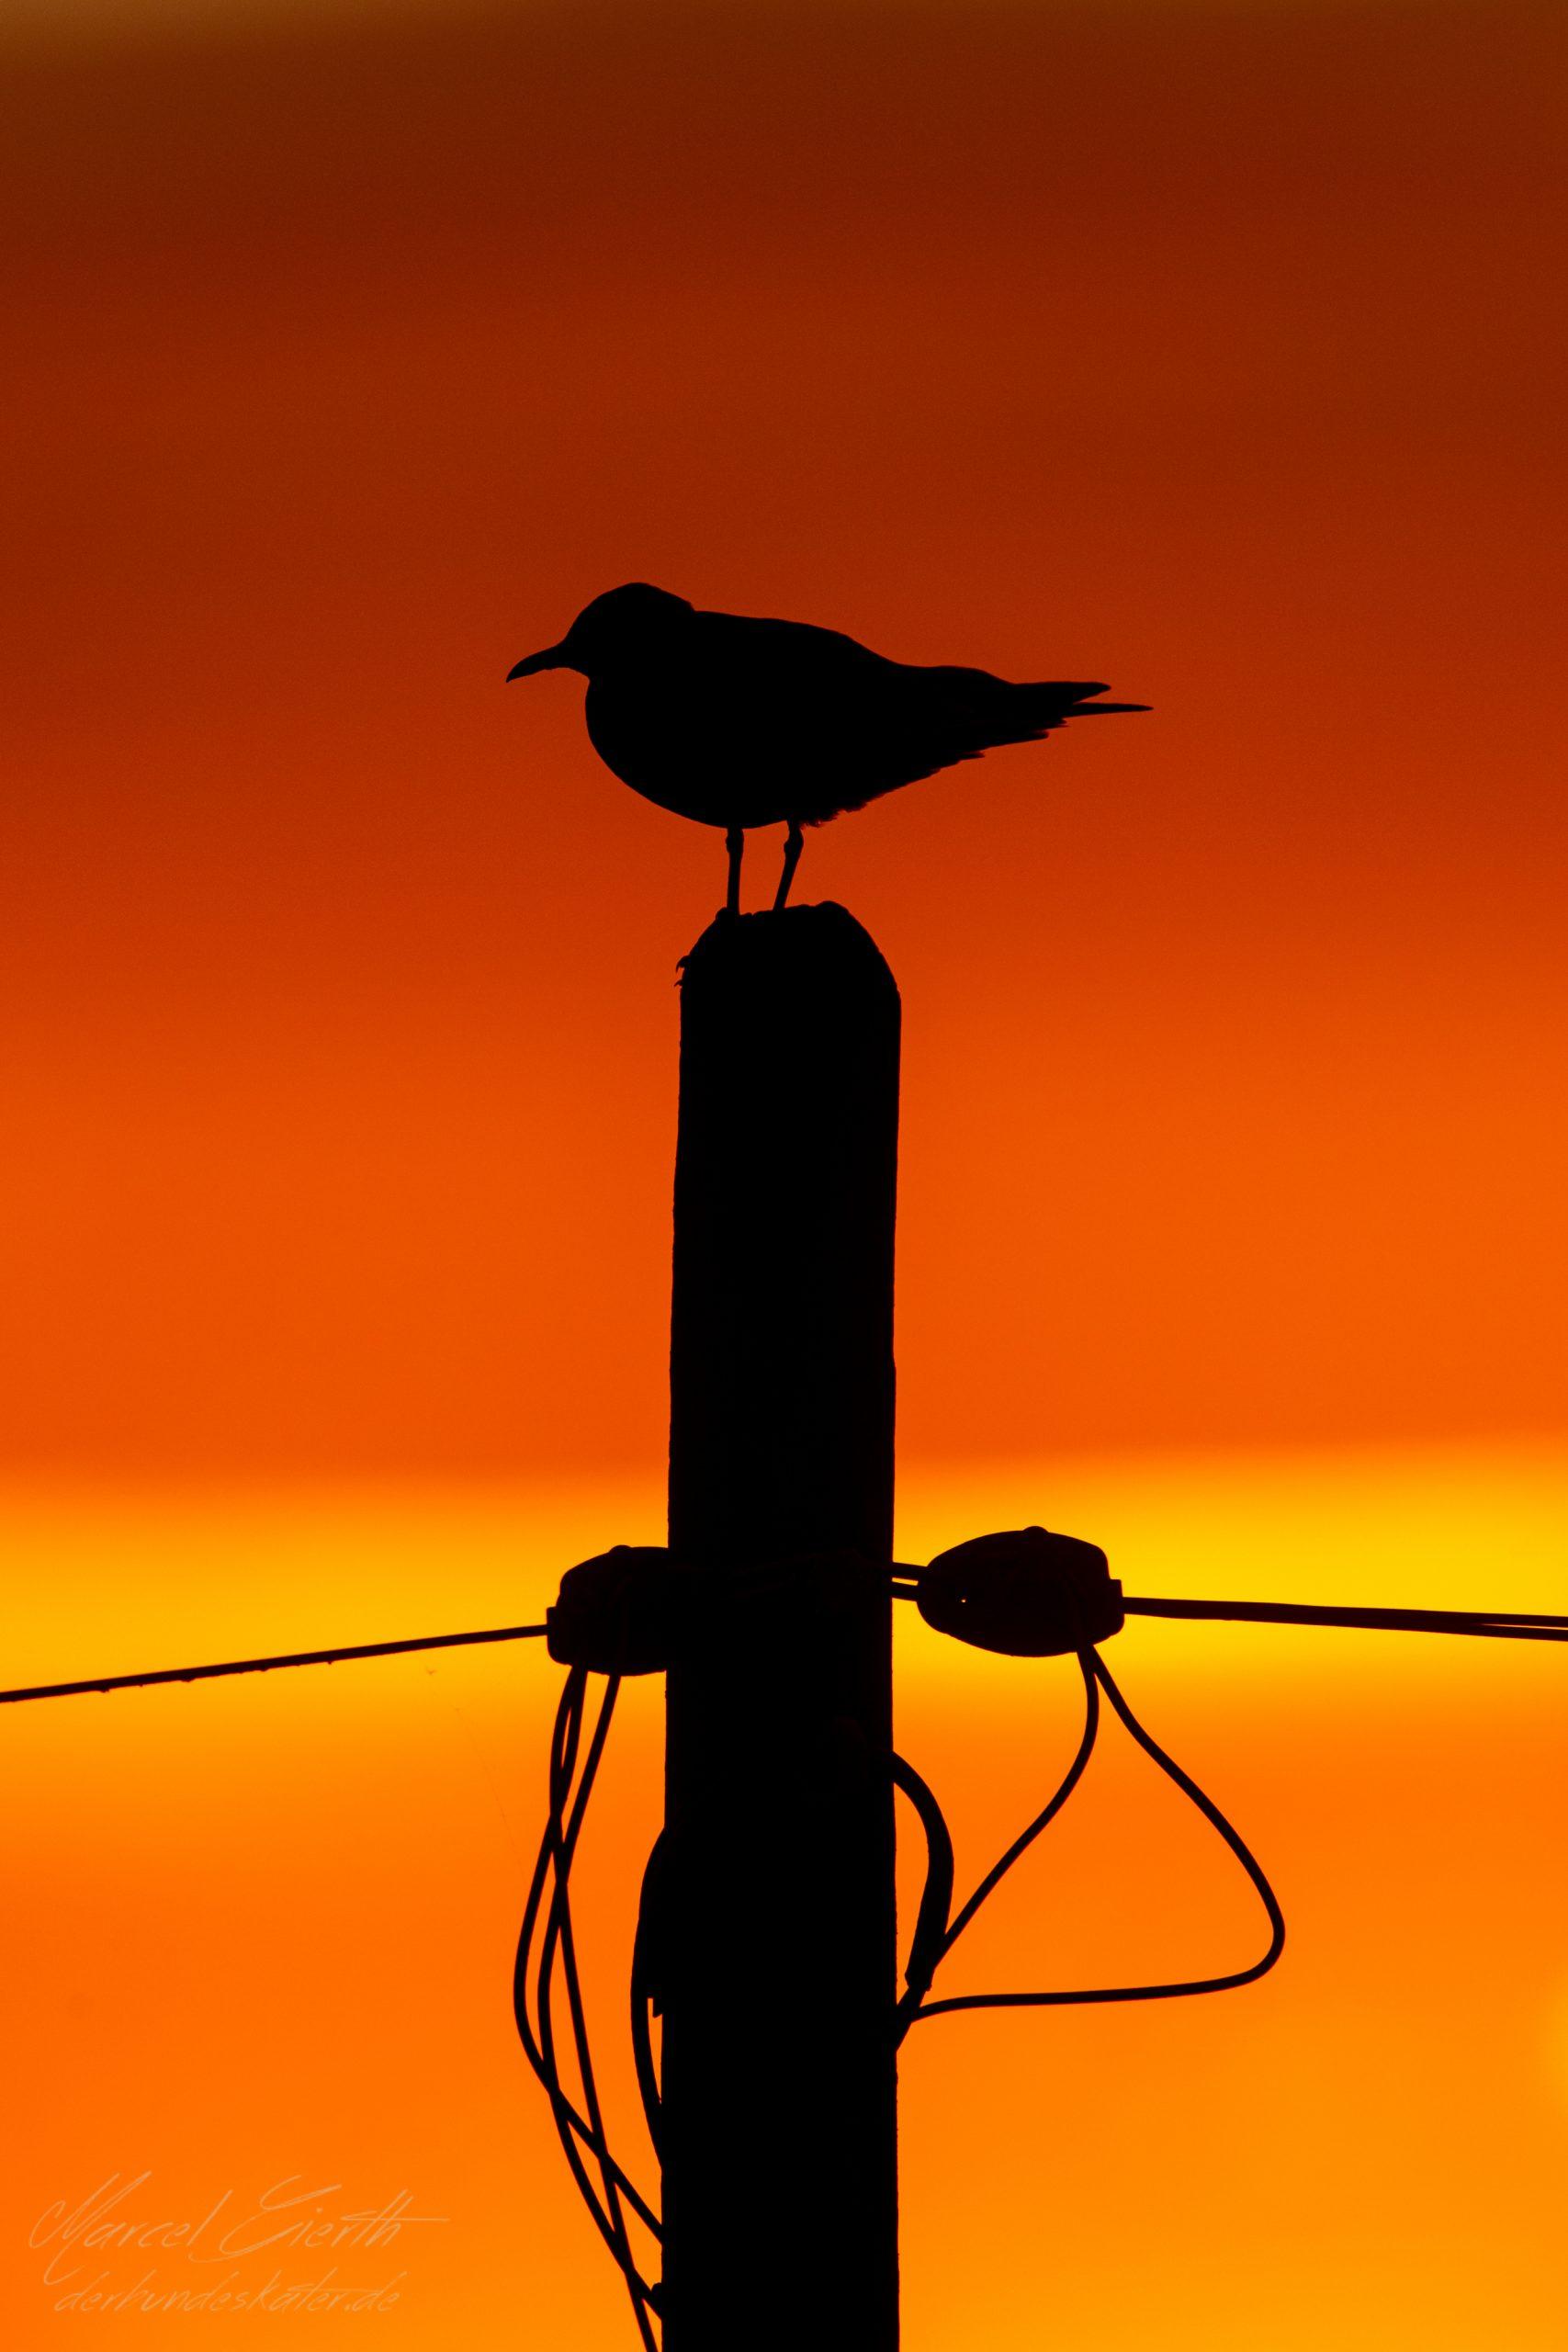 Möwe im Sonnenuntergang im Podelta - Fotograf Marcel Gierth